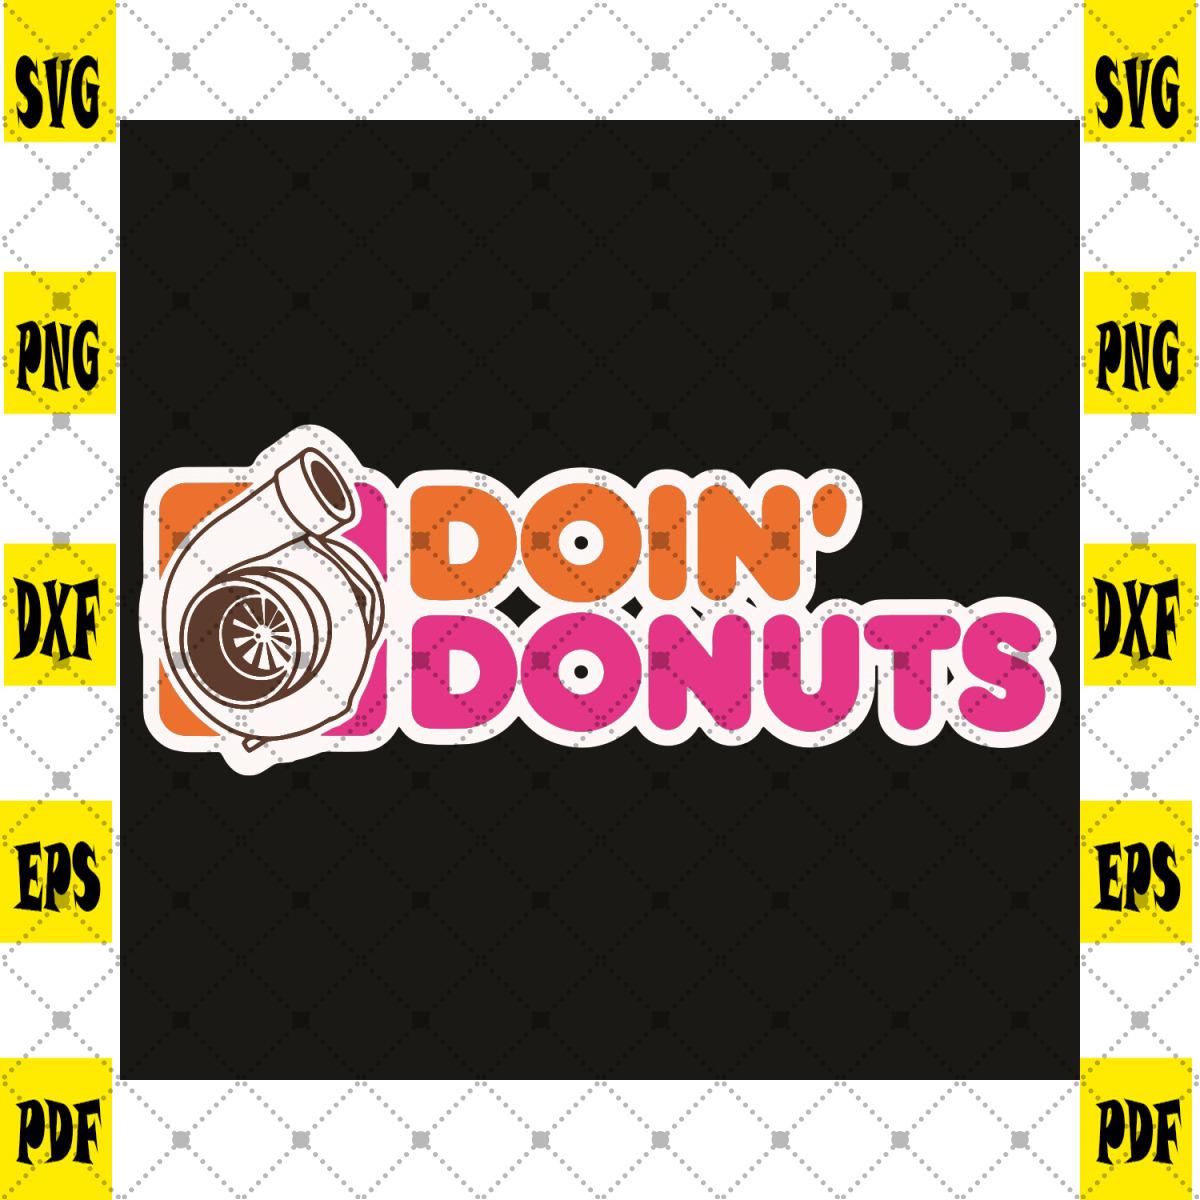 Doin Donuts Svg, Trending Svg, Racing Svg, Drift Car Enthusiast Svg, Racing